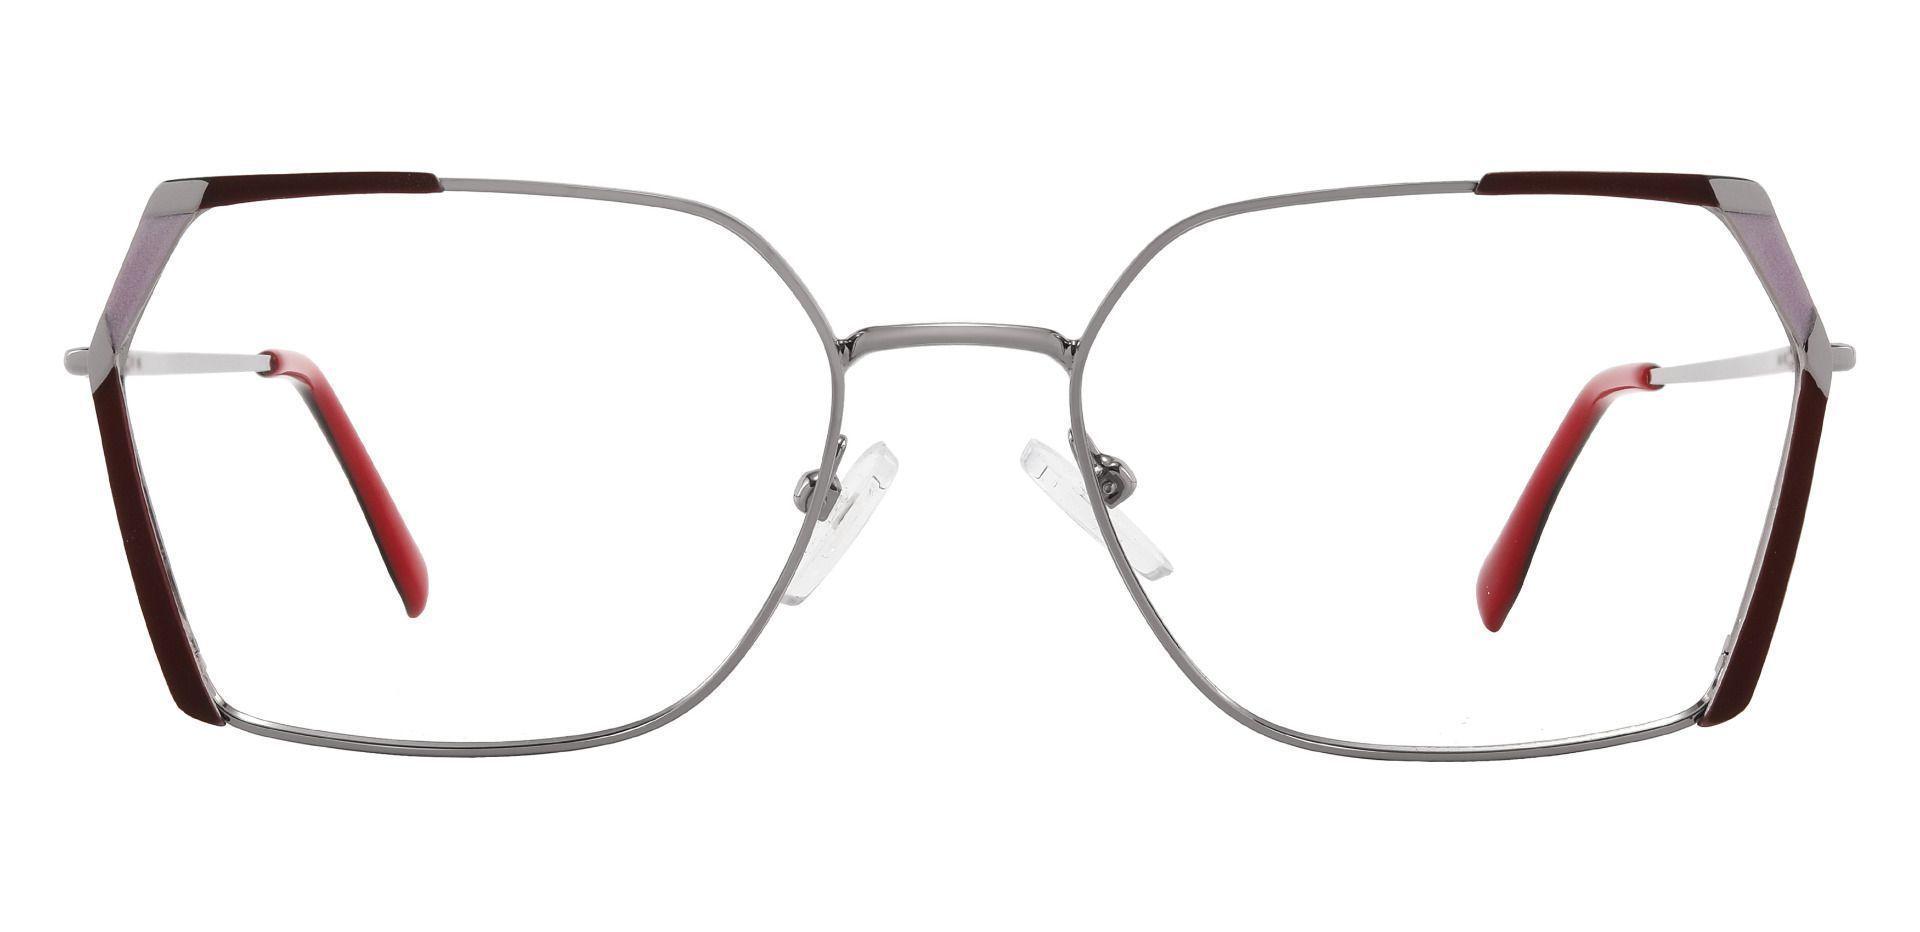 Beverly Geometric Prescription Glasses - Red